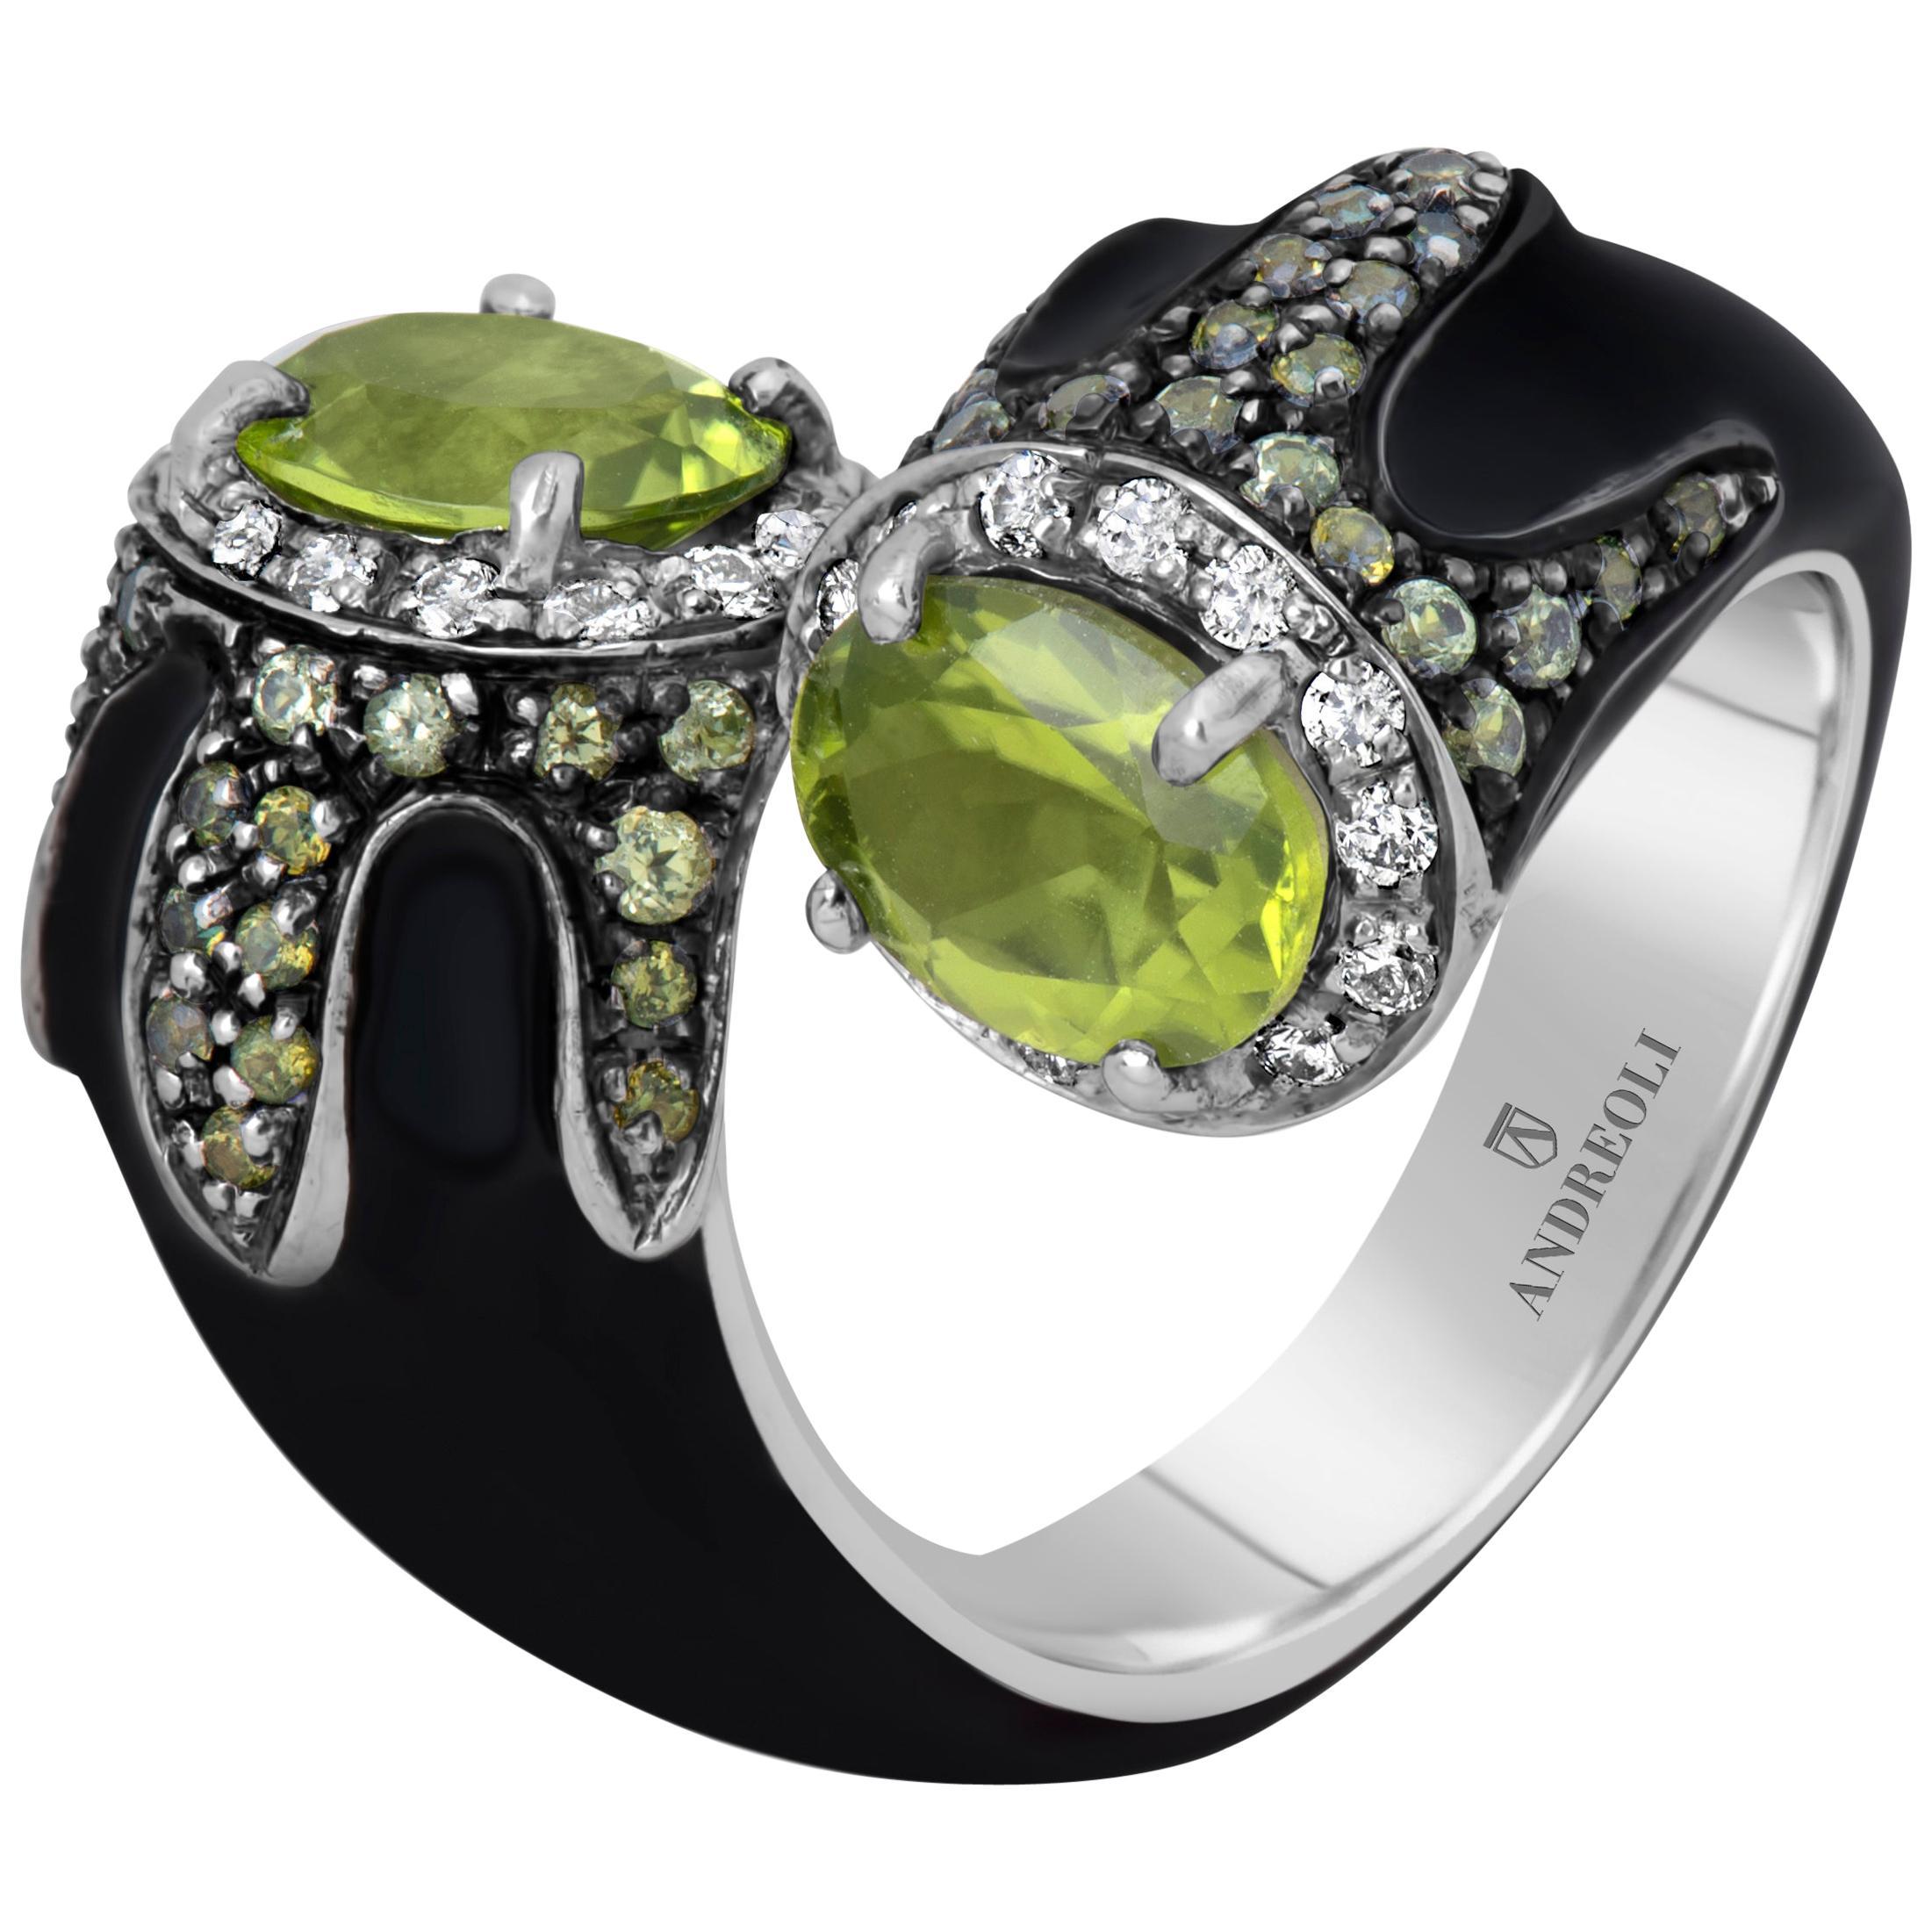 Andreoli Black Enamel Peridot Diamond Bypass Cocktail Ring Silver 18 Karat Gold